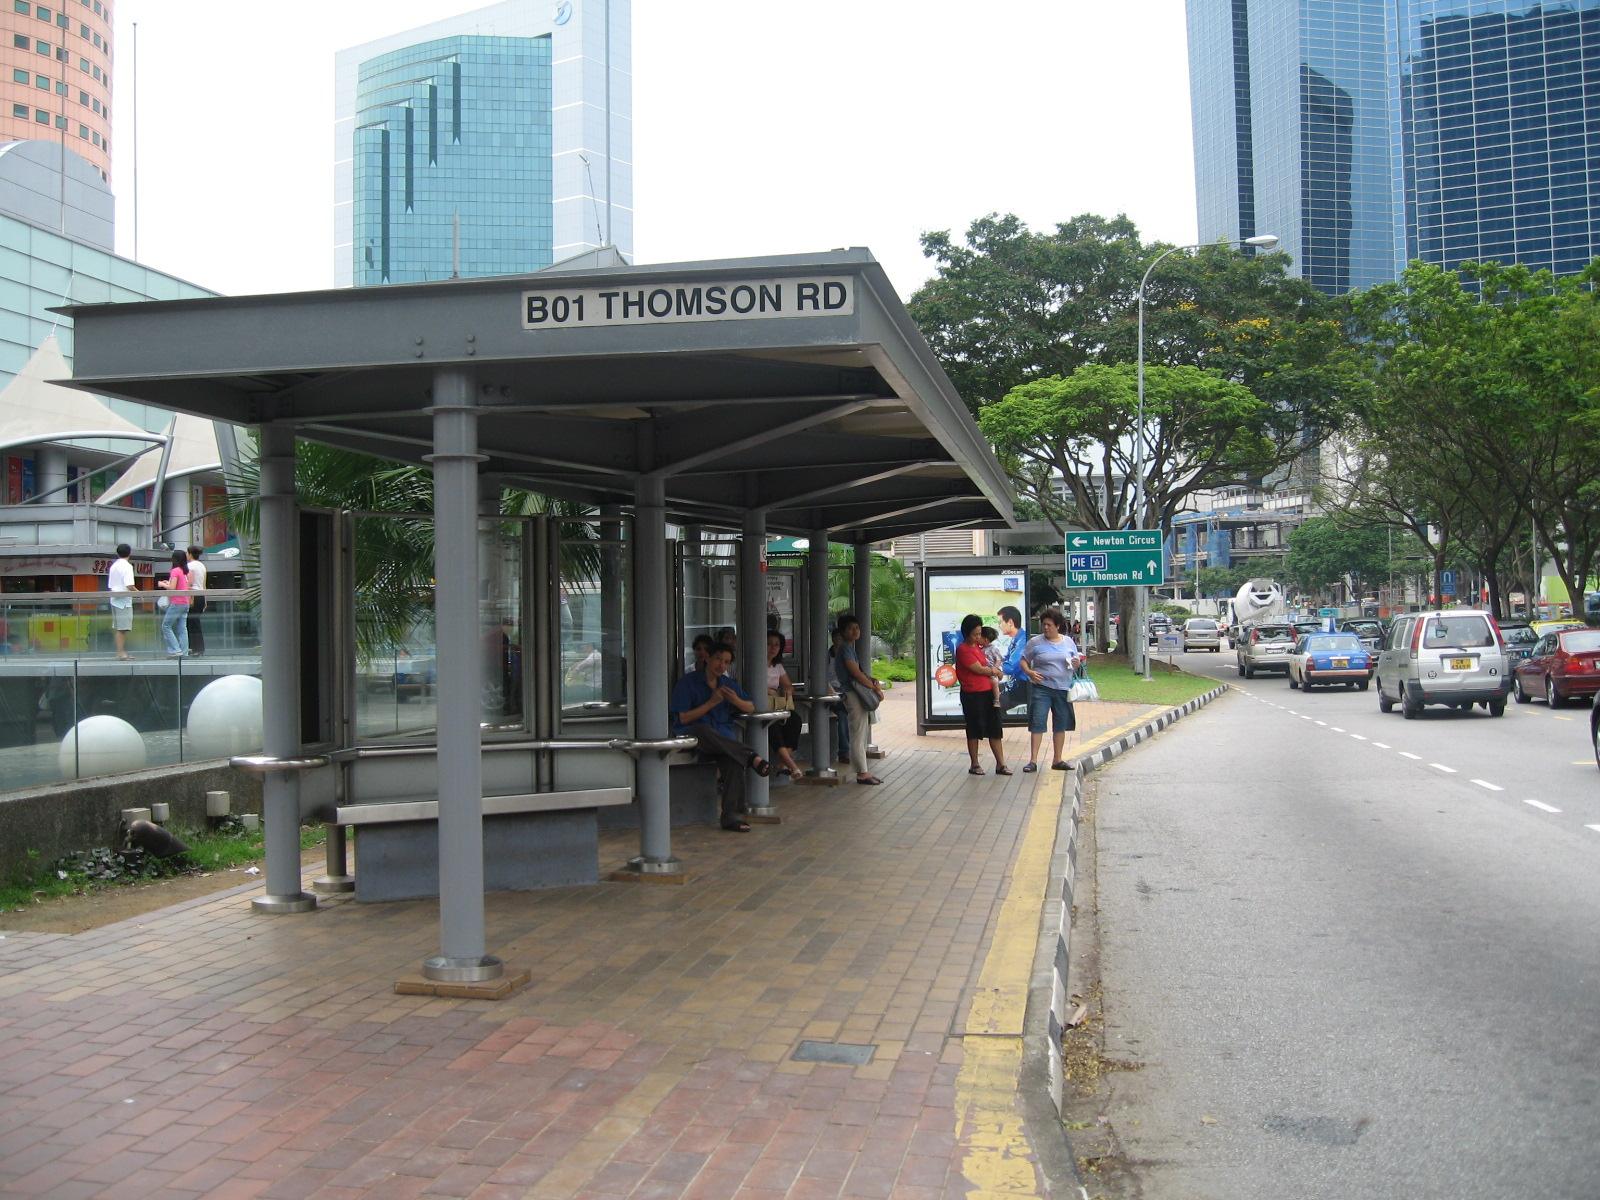 File:SG bus stop 2.JPG...